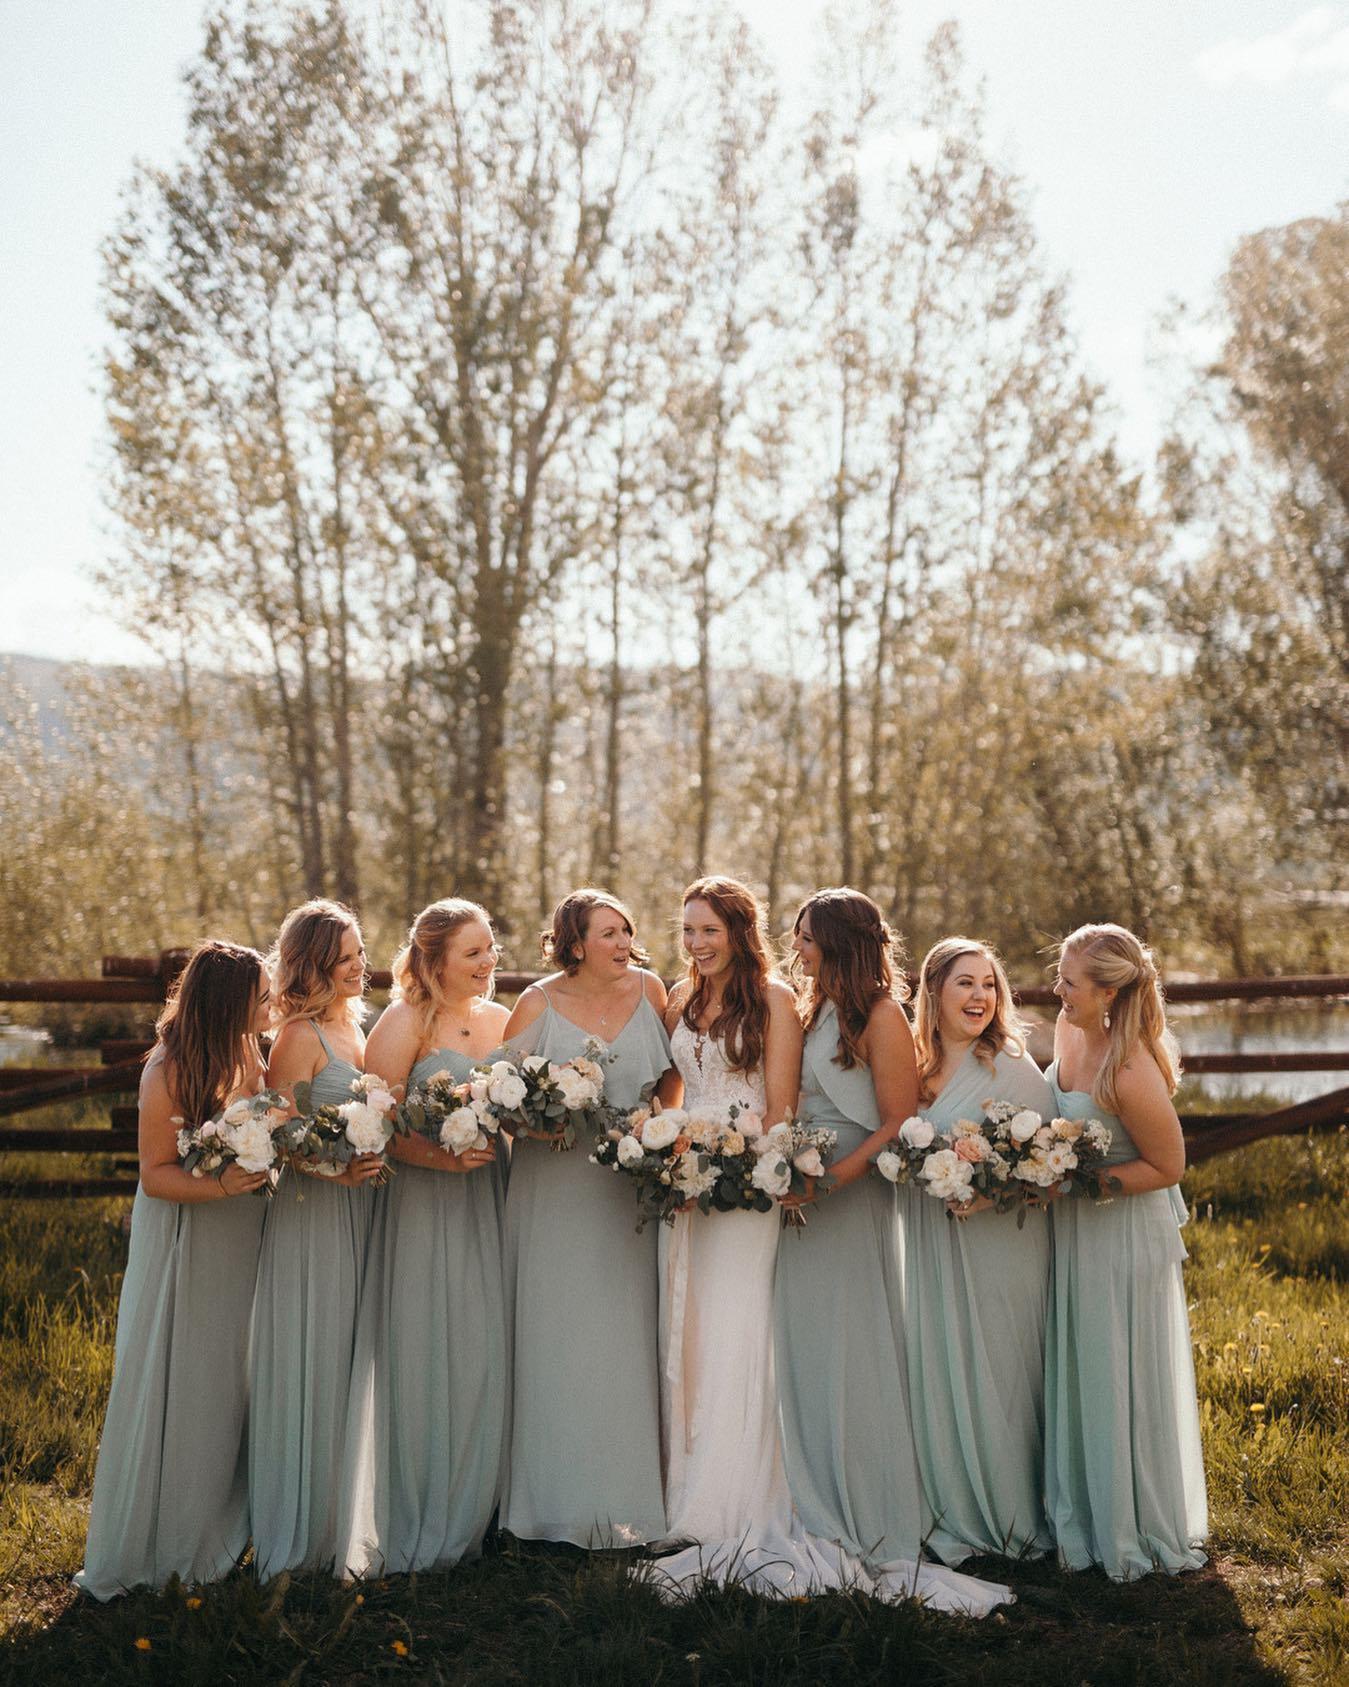 Image taken by morganashleycox of Christina Convertible Dress - Sage